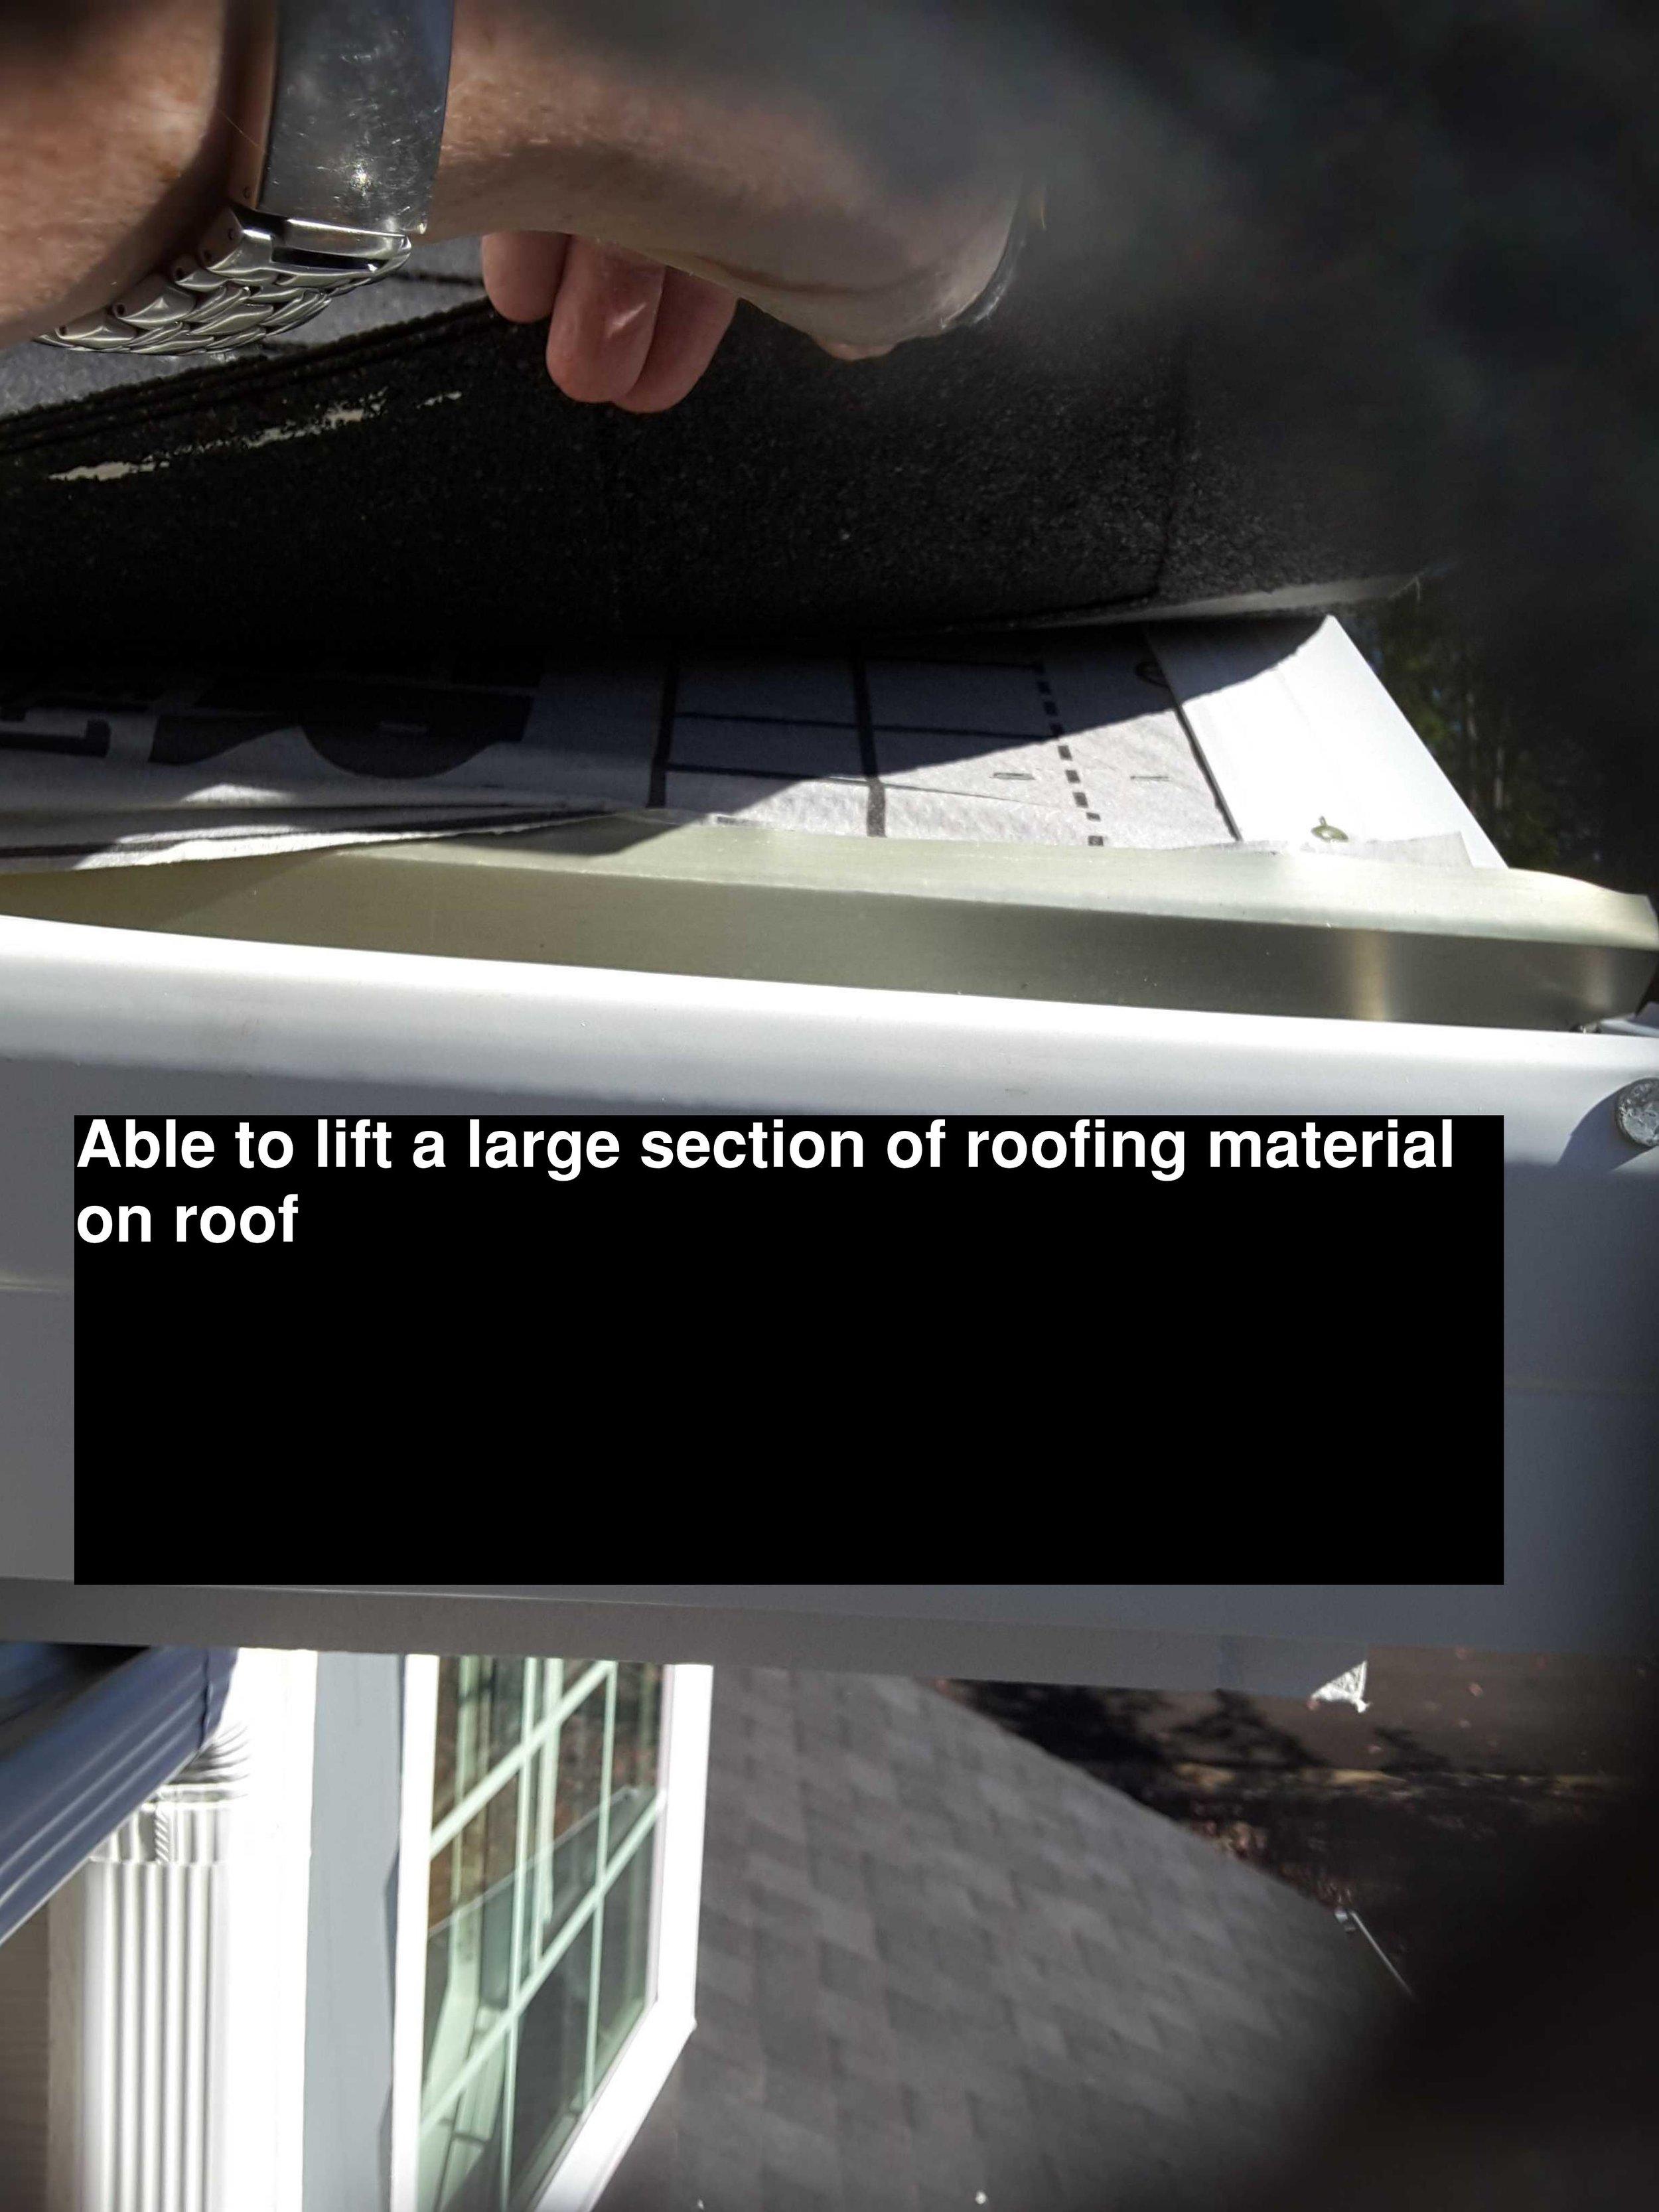 Roofinging material.jpg